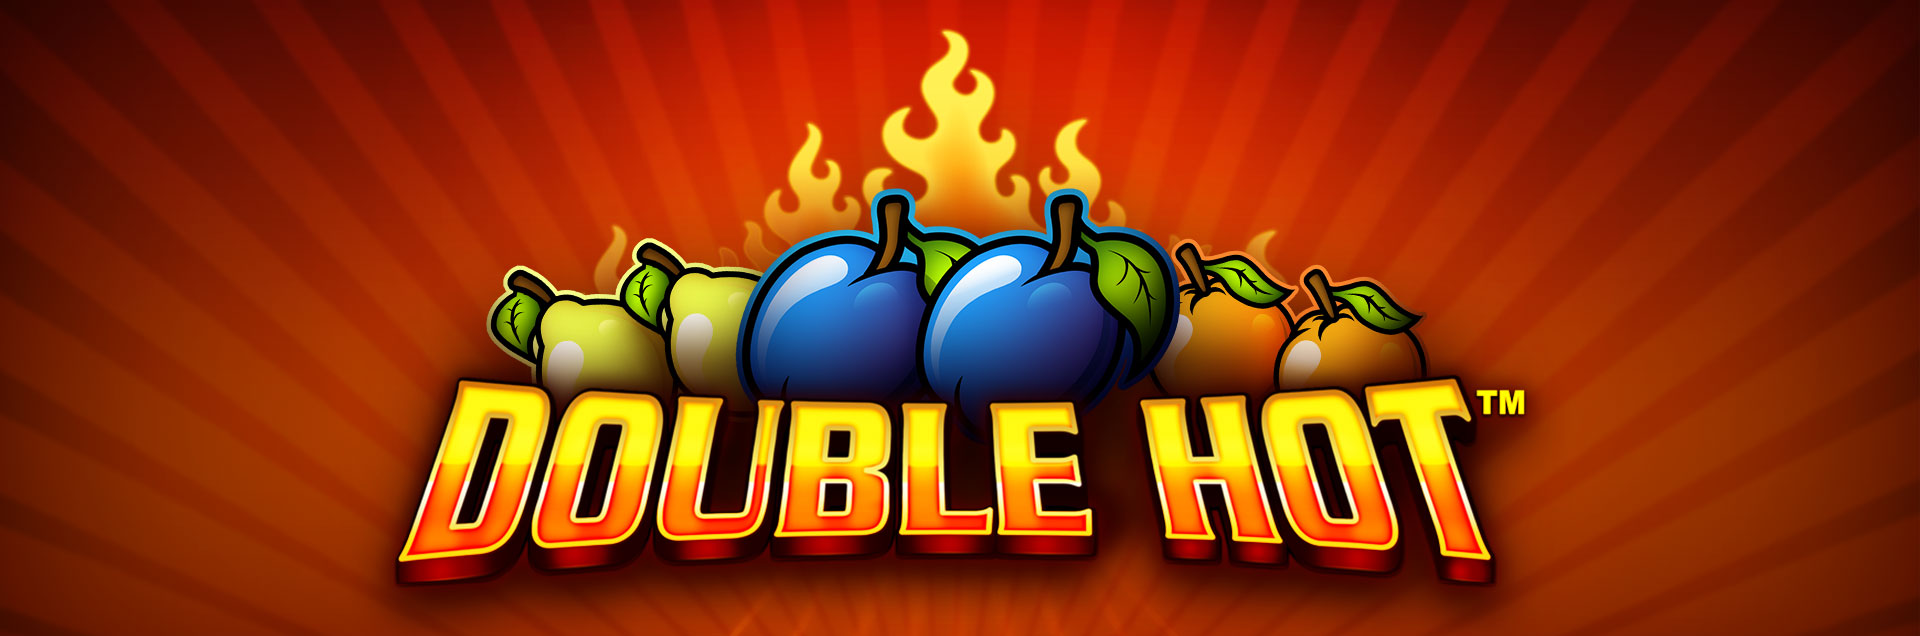 DoubleHot logo